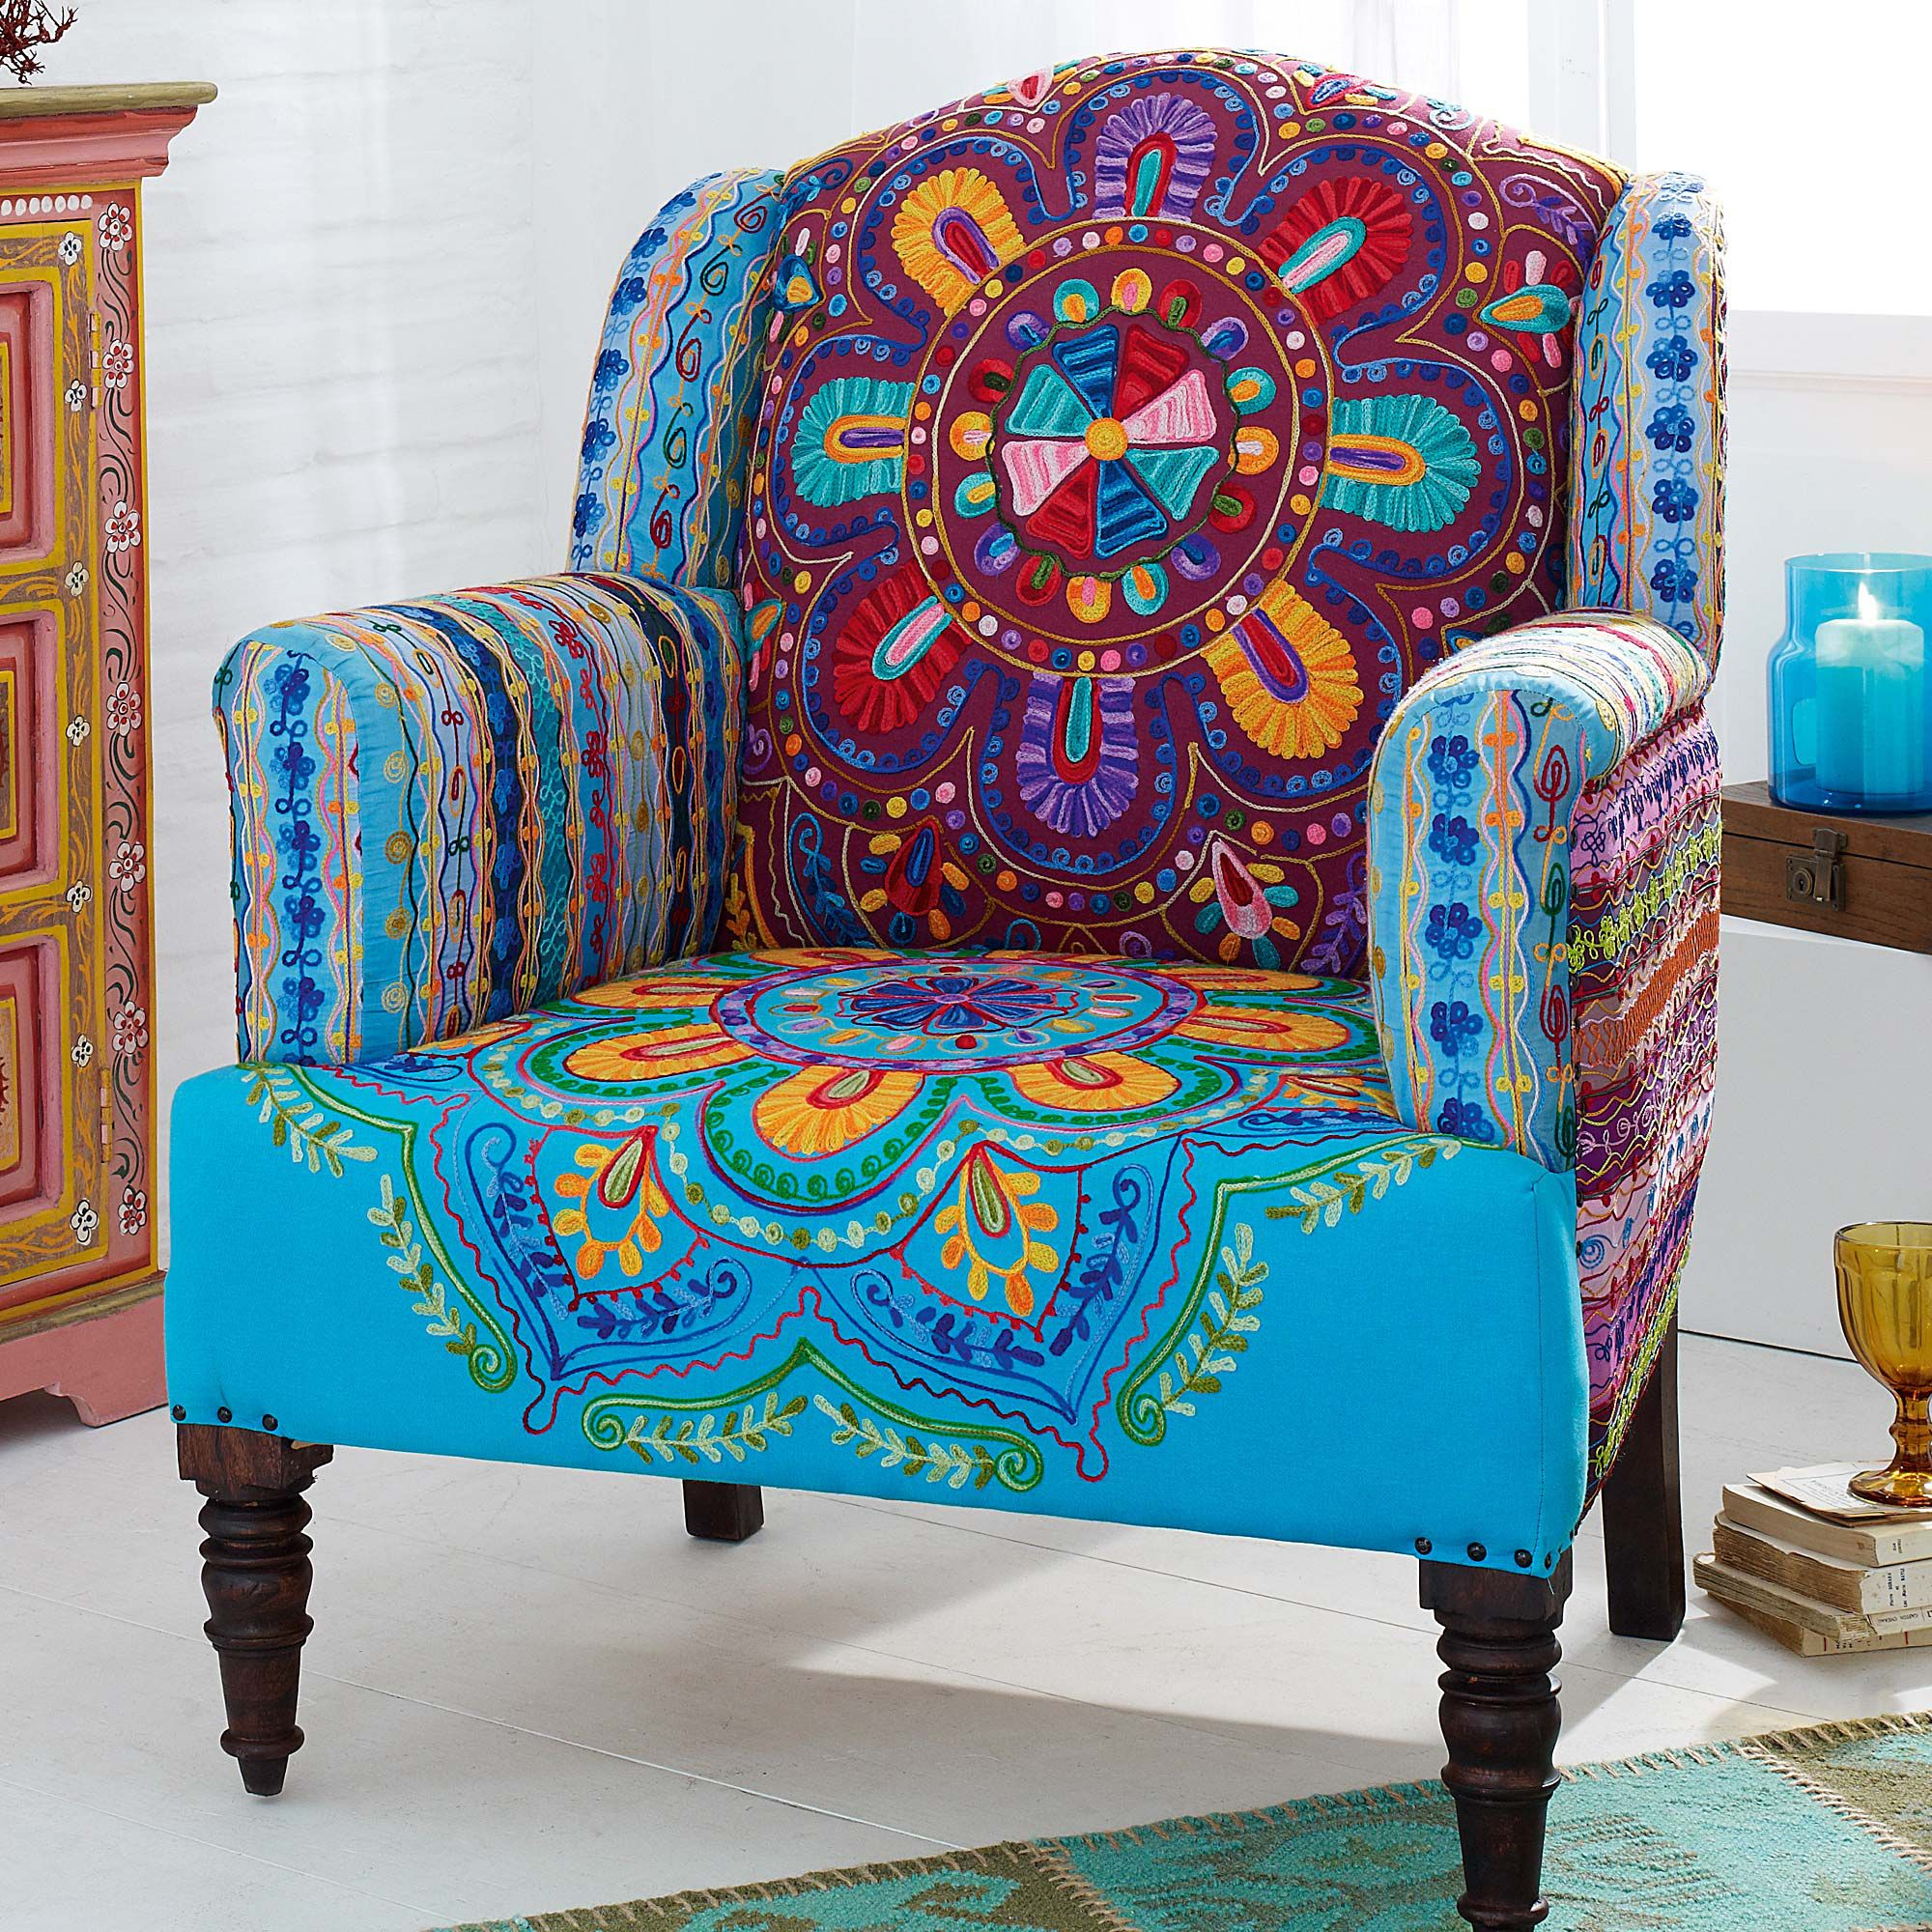 sessel manda gingar moebel furnishings pinterest boho bohemian and upholstery. Black Bedroom Furniture Sets. Home Design Ideas